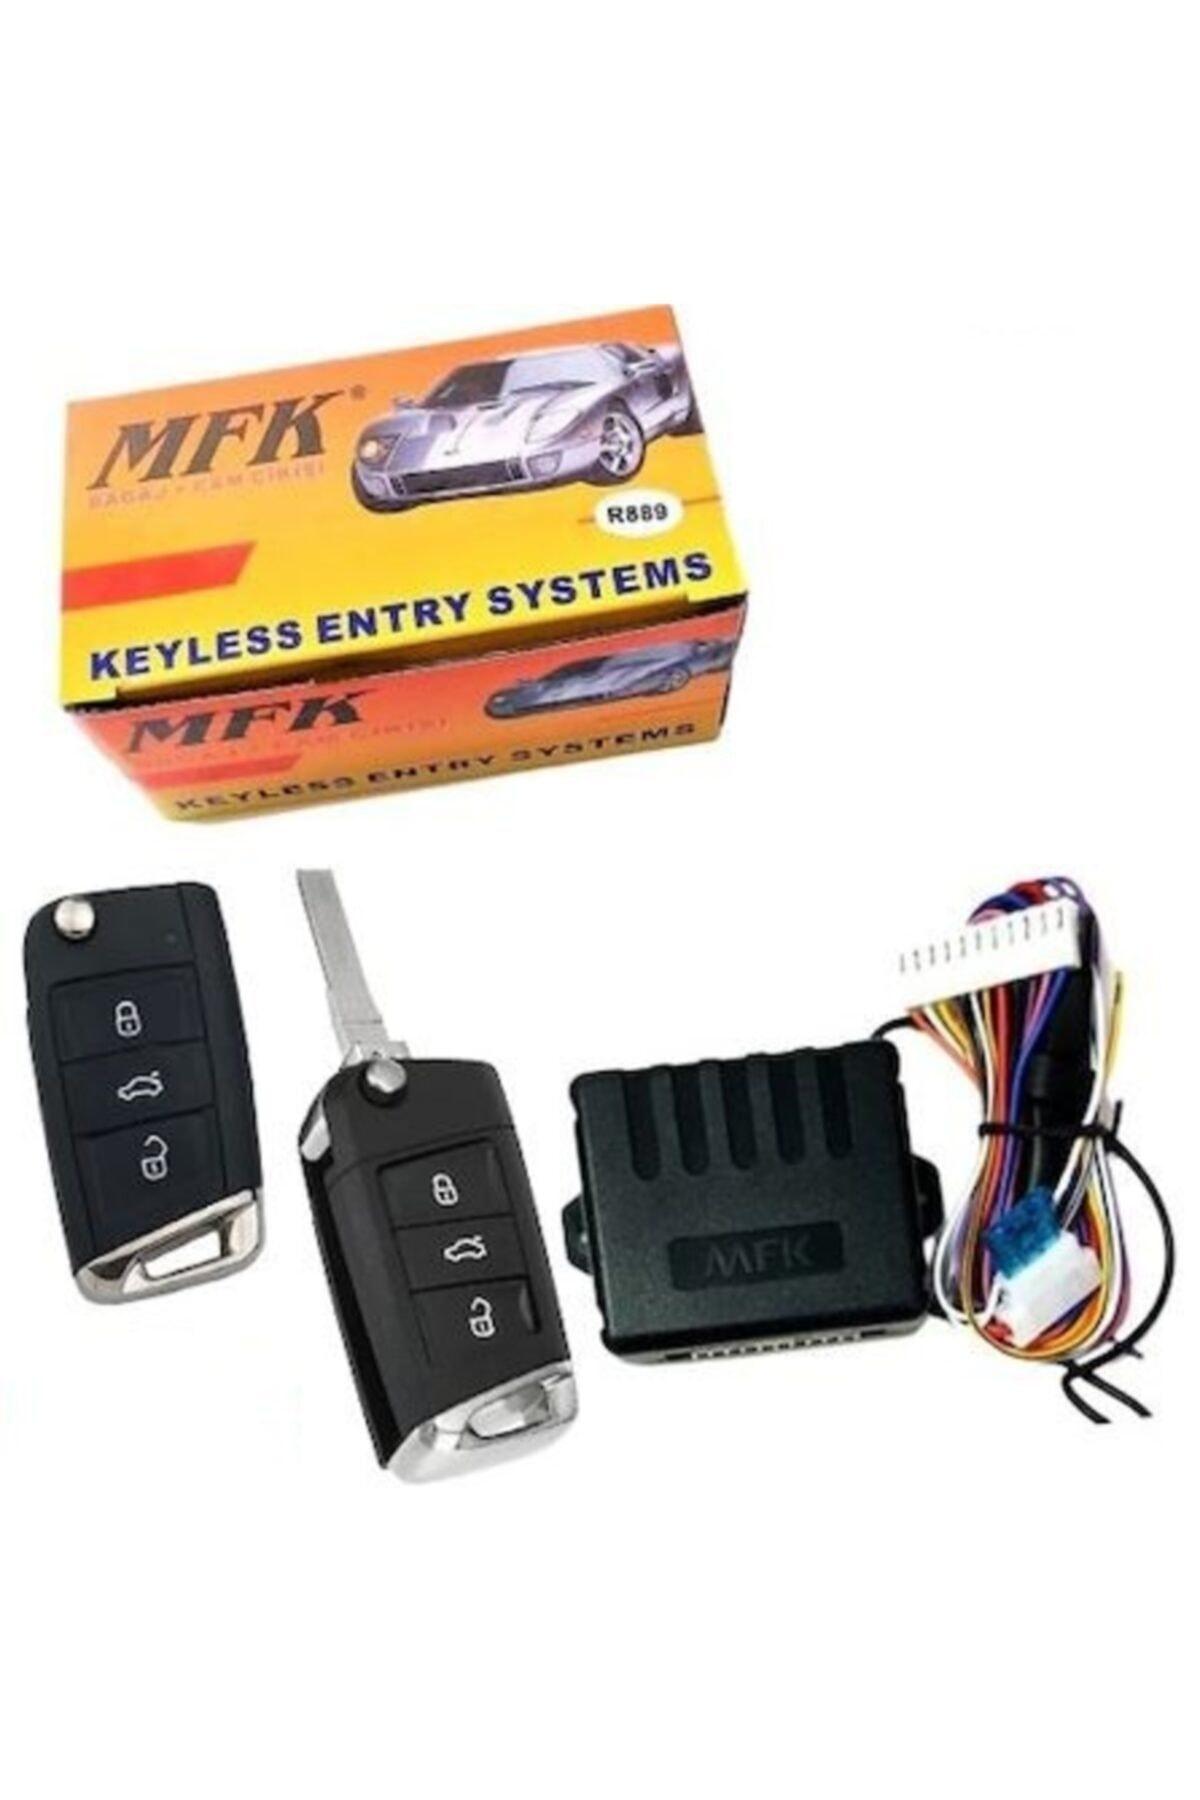 EMA-MFK Yeni Model Açma Kapama Sustalı Kumanda Set 1